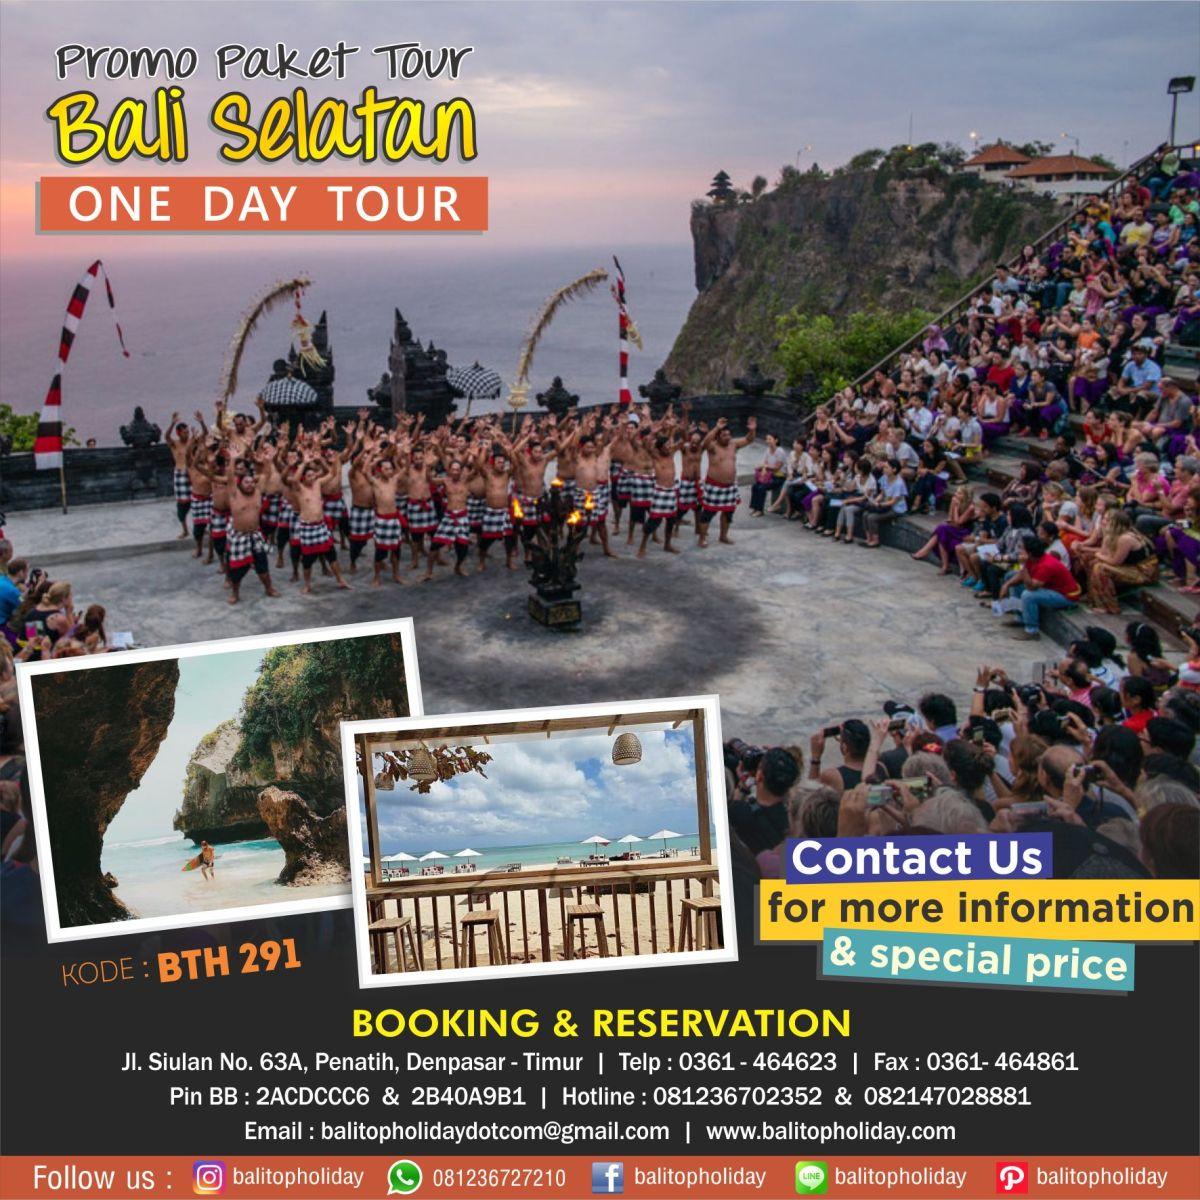 Bali selatan One Day Tour BTH 291